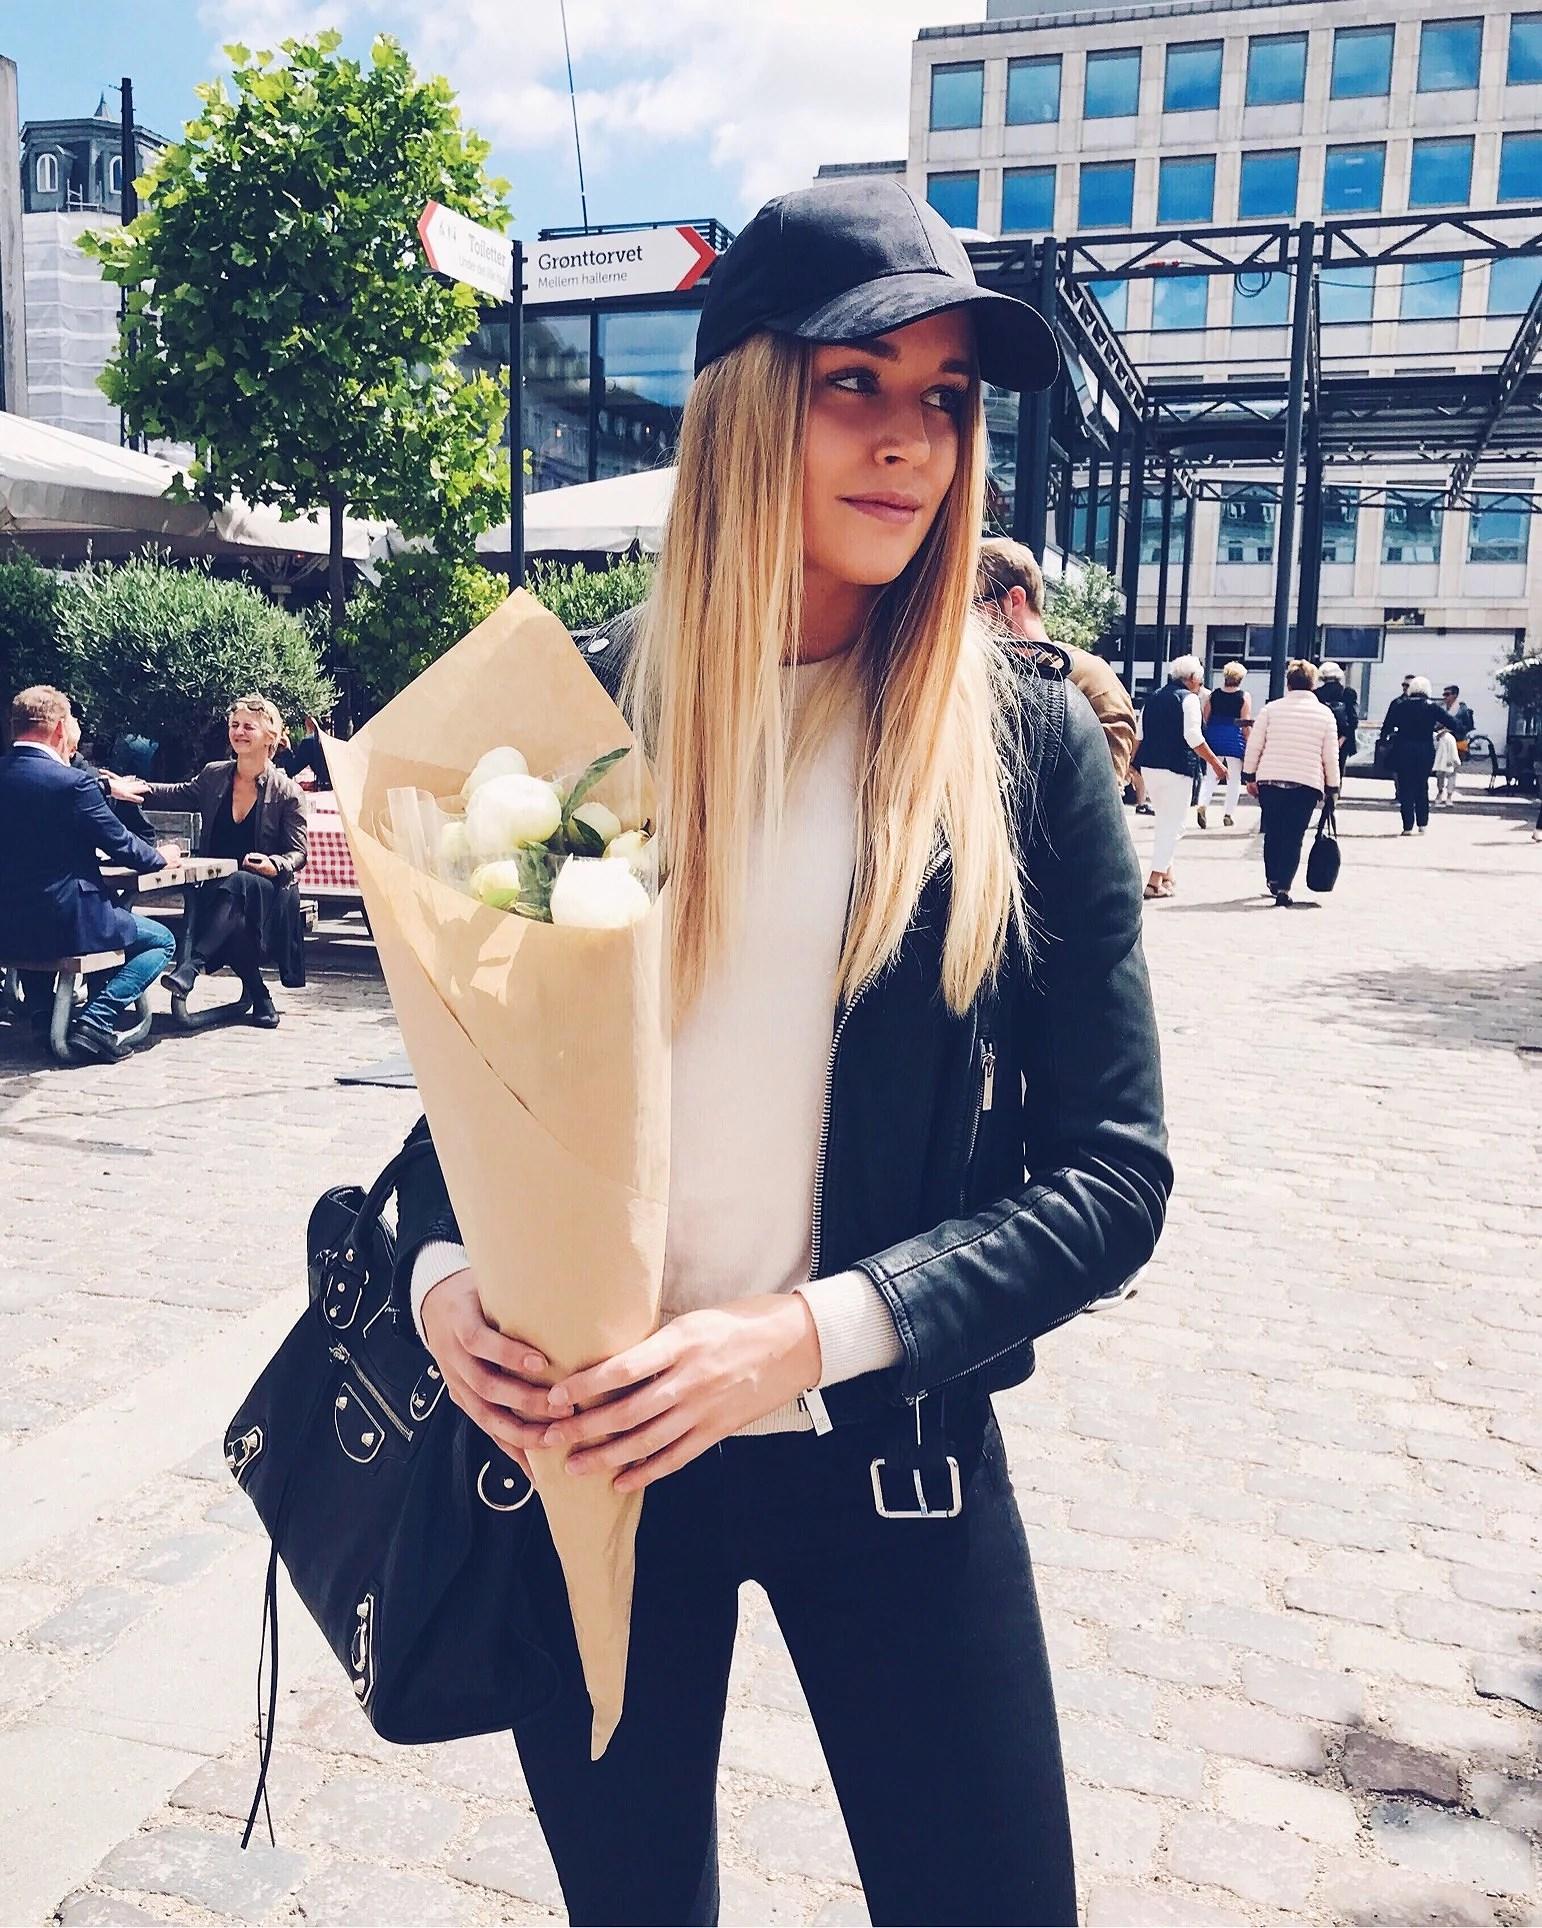 GREAT DAY IN COPENHAGEN